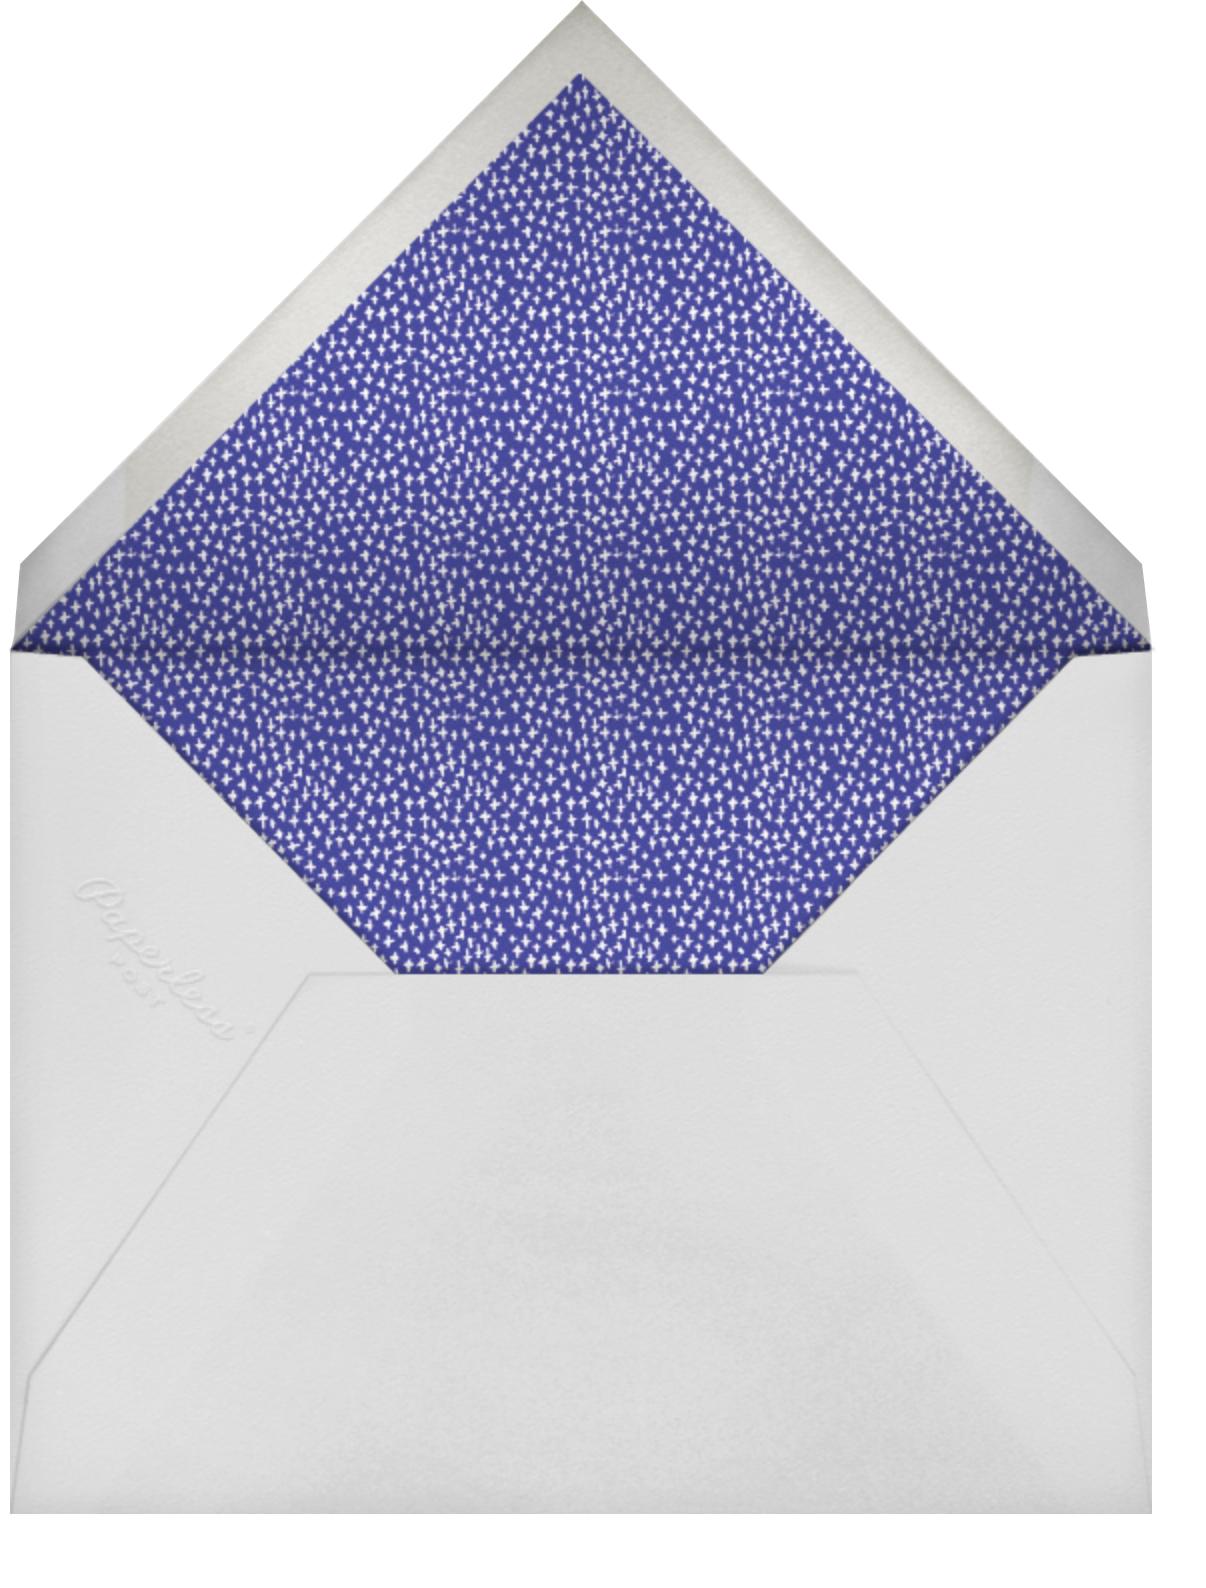 Wild Style (Square) - Green - Mr. Boddington's Studio - Kids' birthday - envelope back